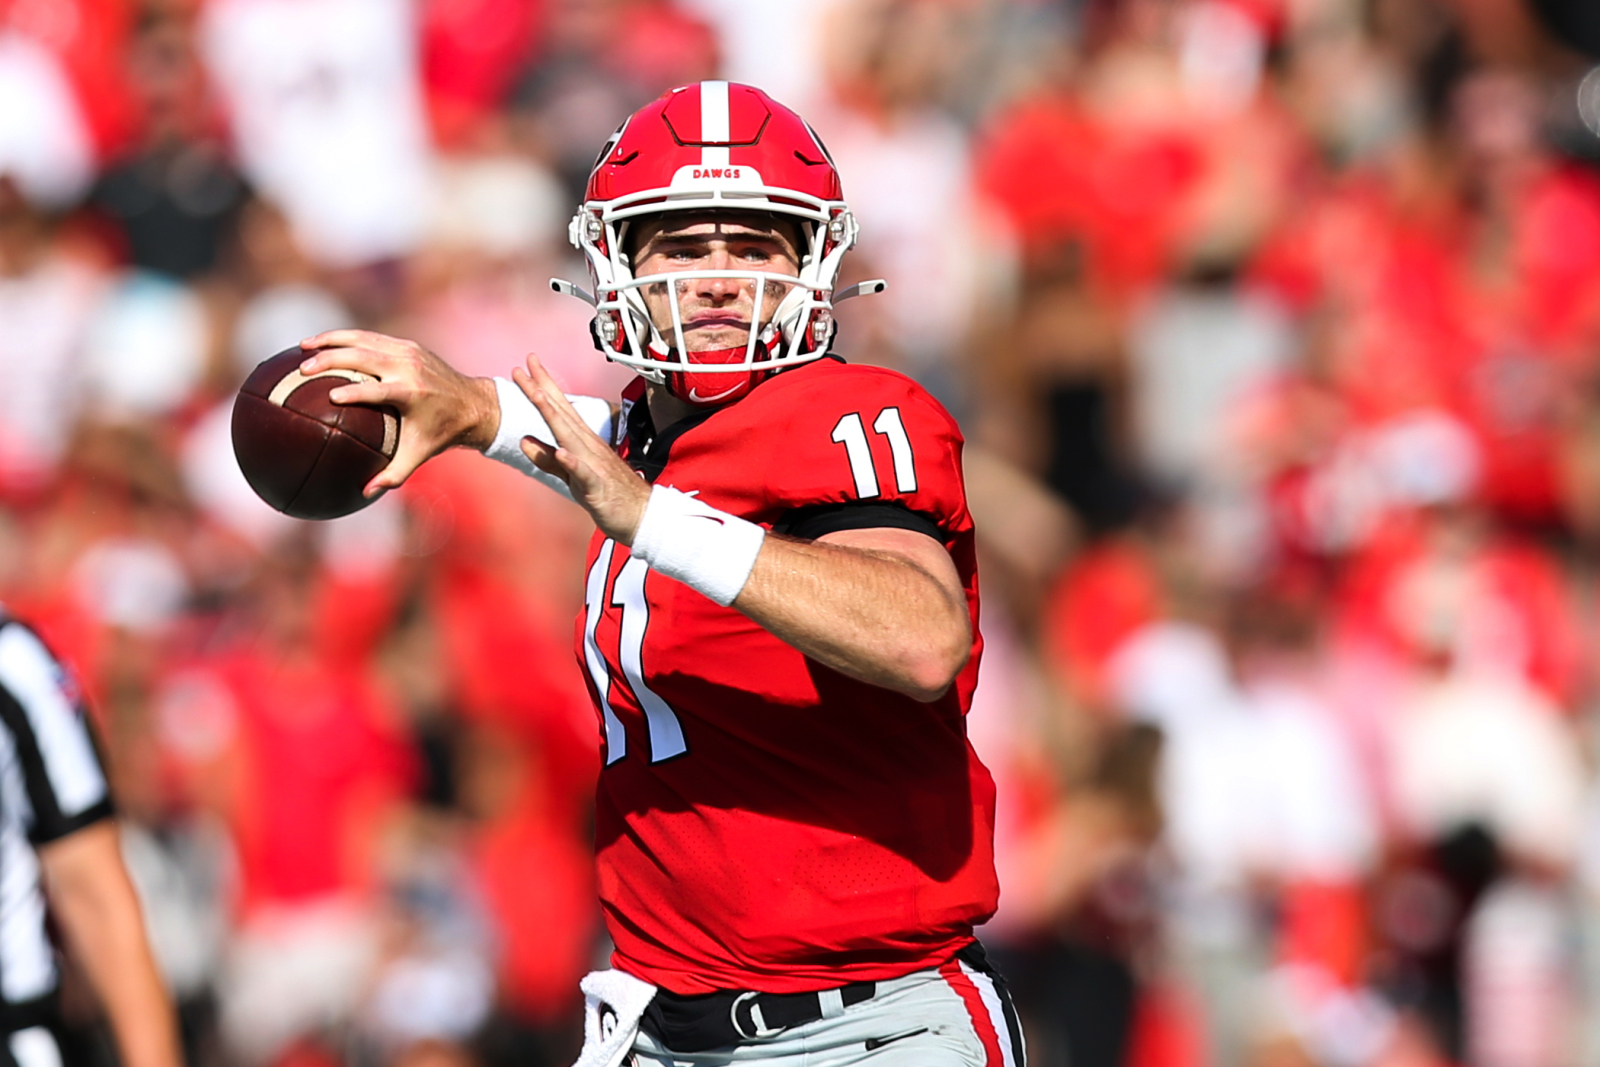 Georgia Football: How is Jake Fromm flying under NFL draft radar?